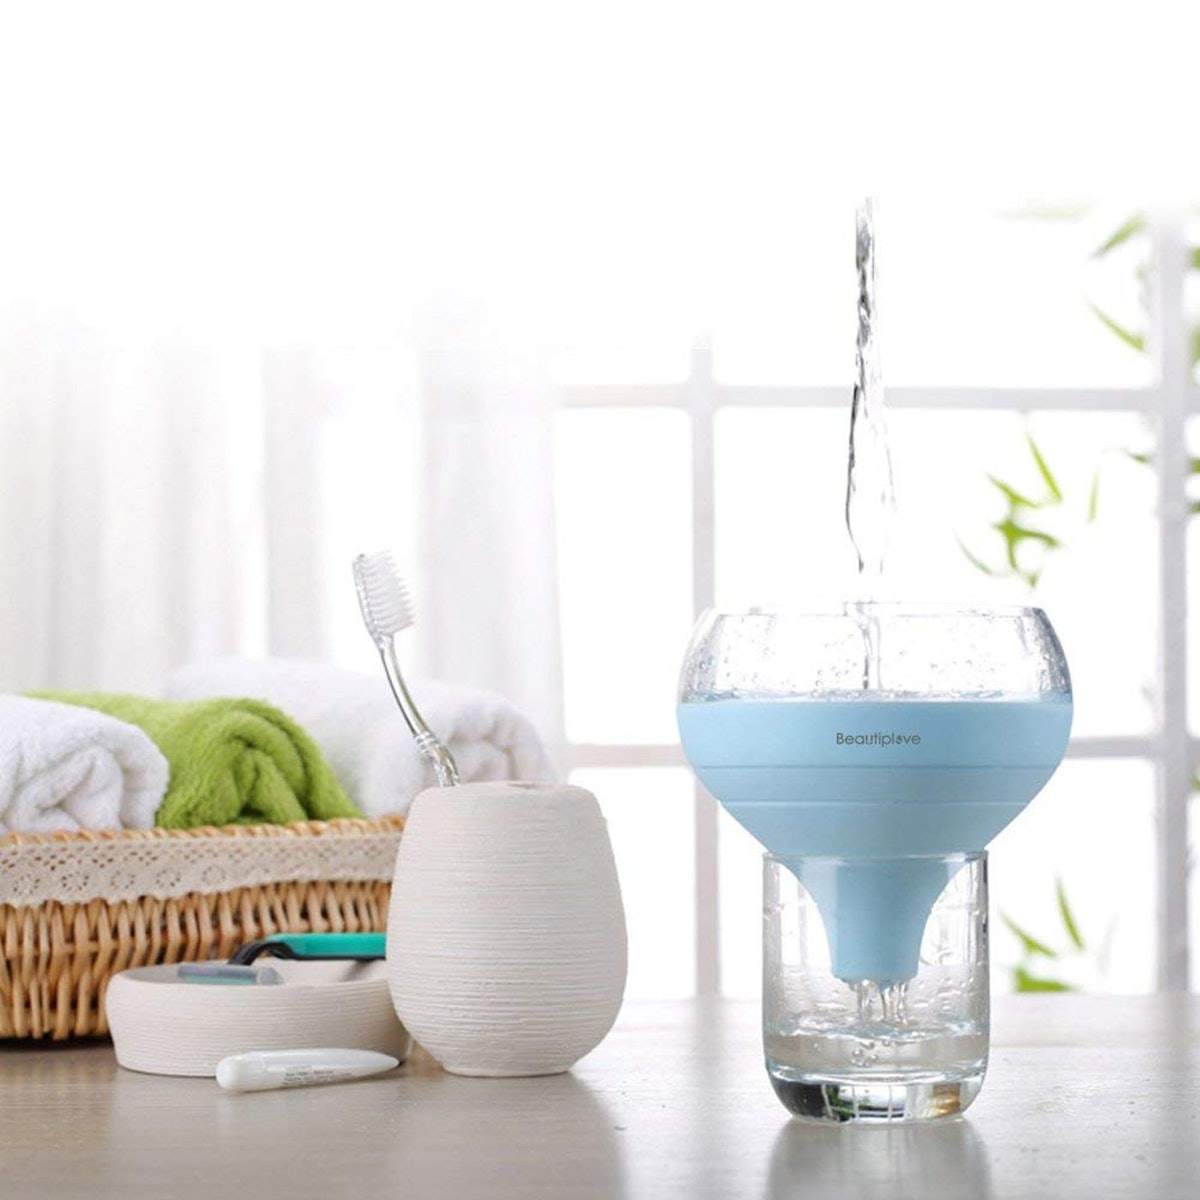 Beautiplove Water Filter